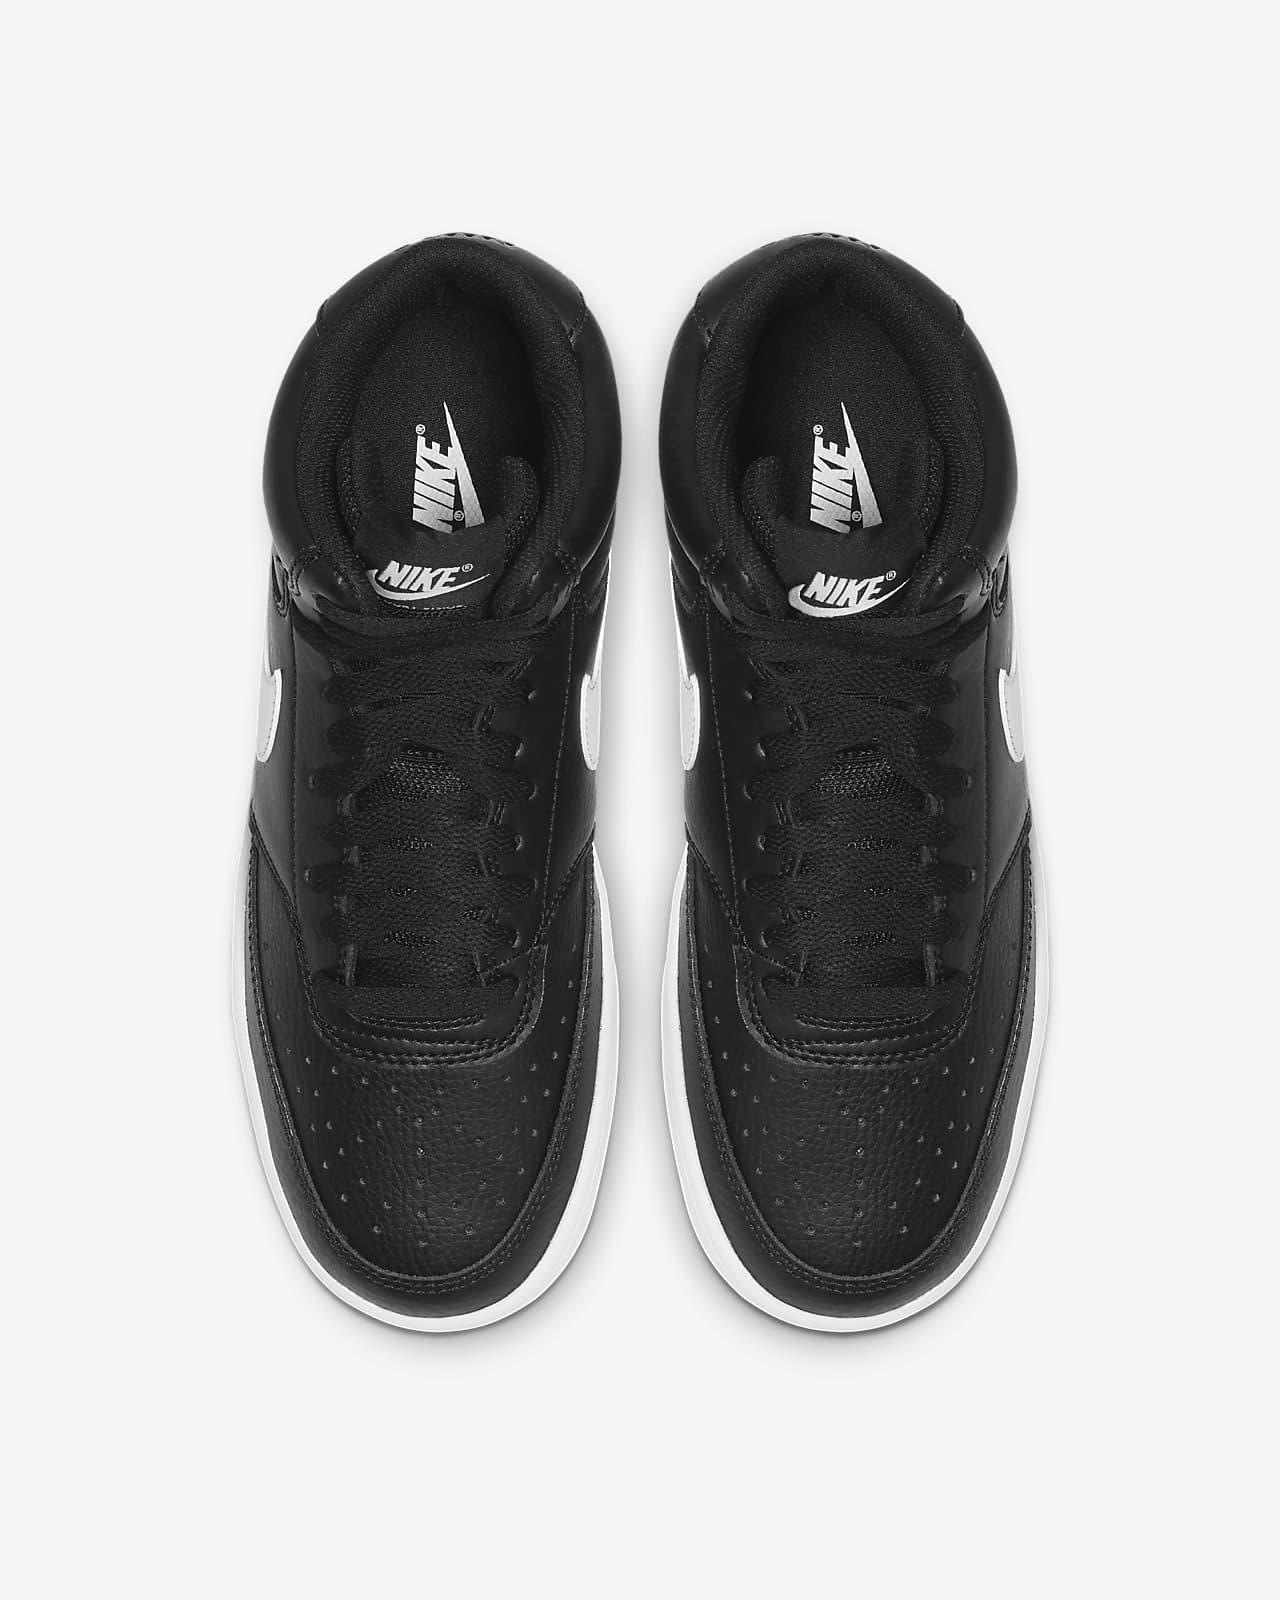 NikeCourt Vision Mid Women's Shoes